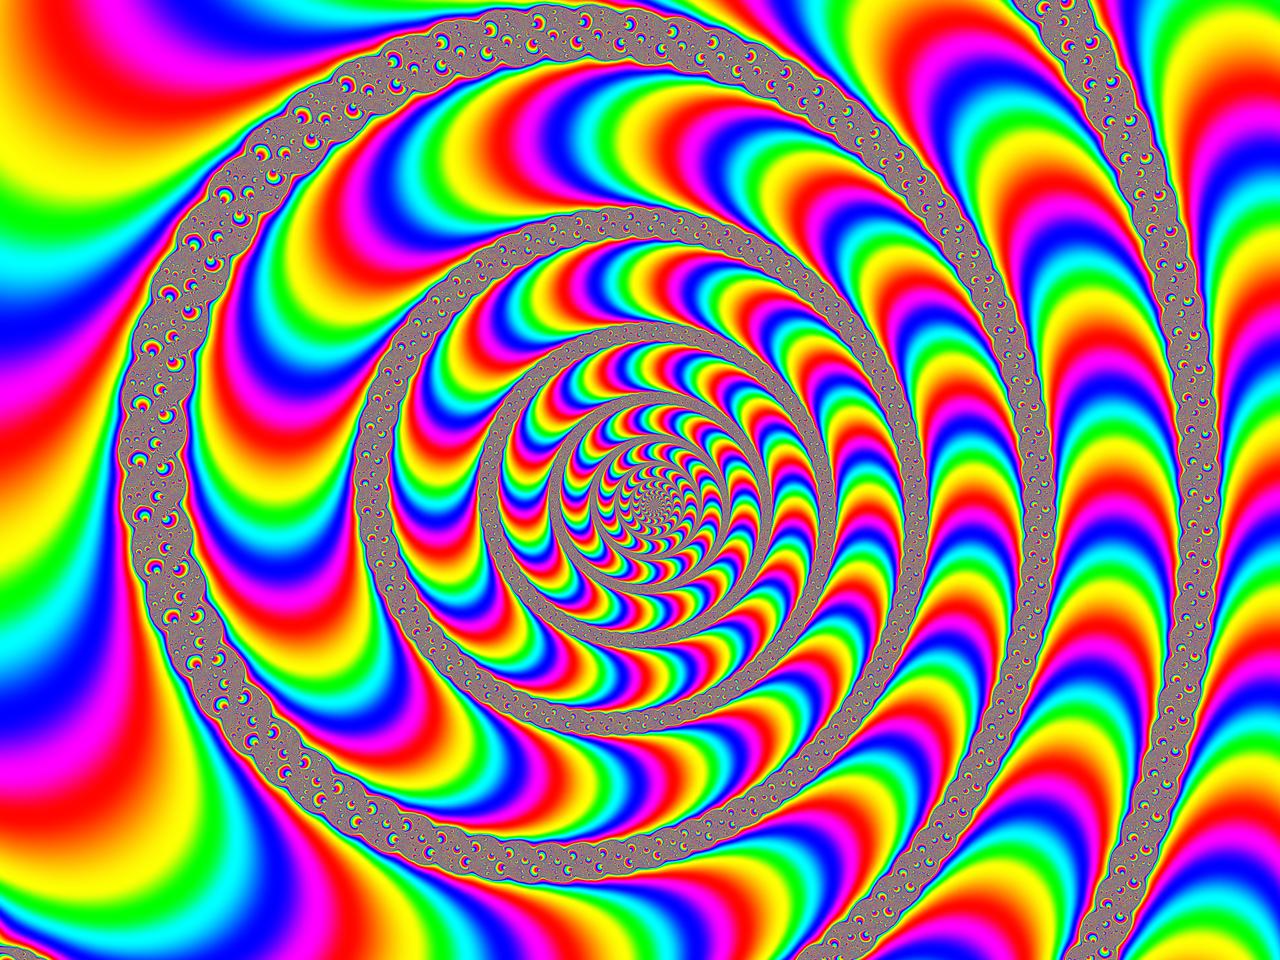 hypnosis moving wallpaper hypnotic - photo #15